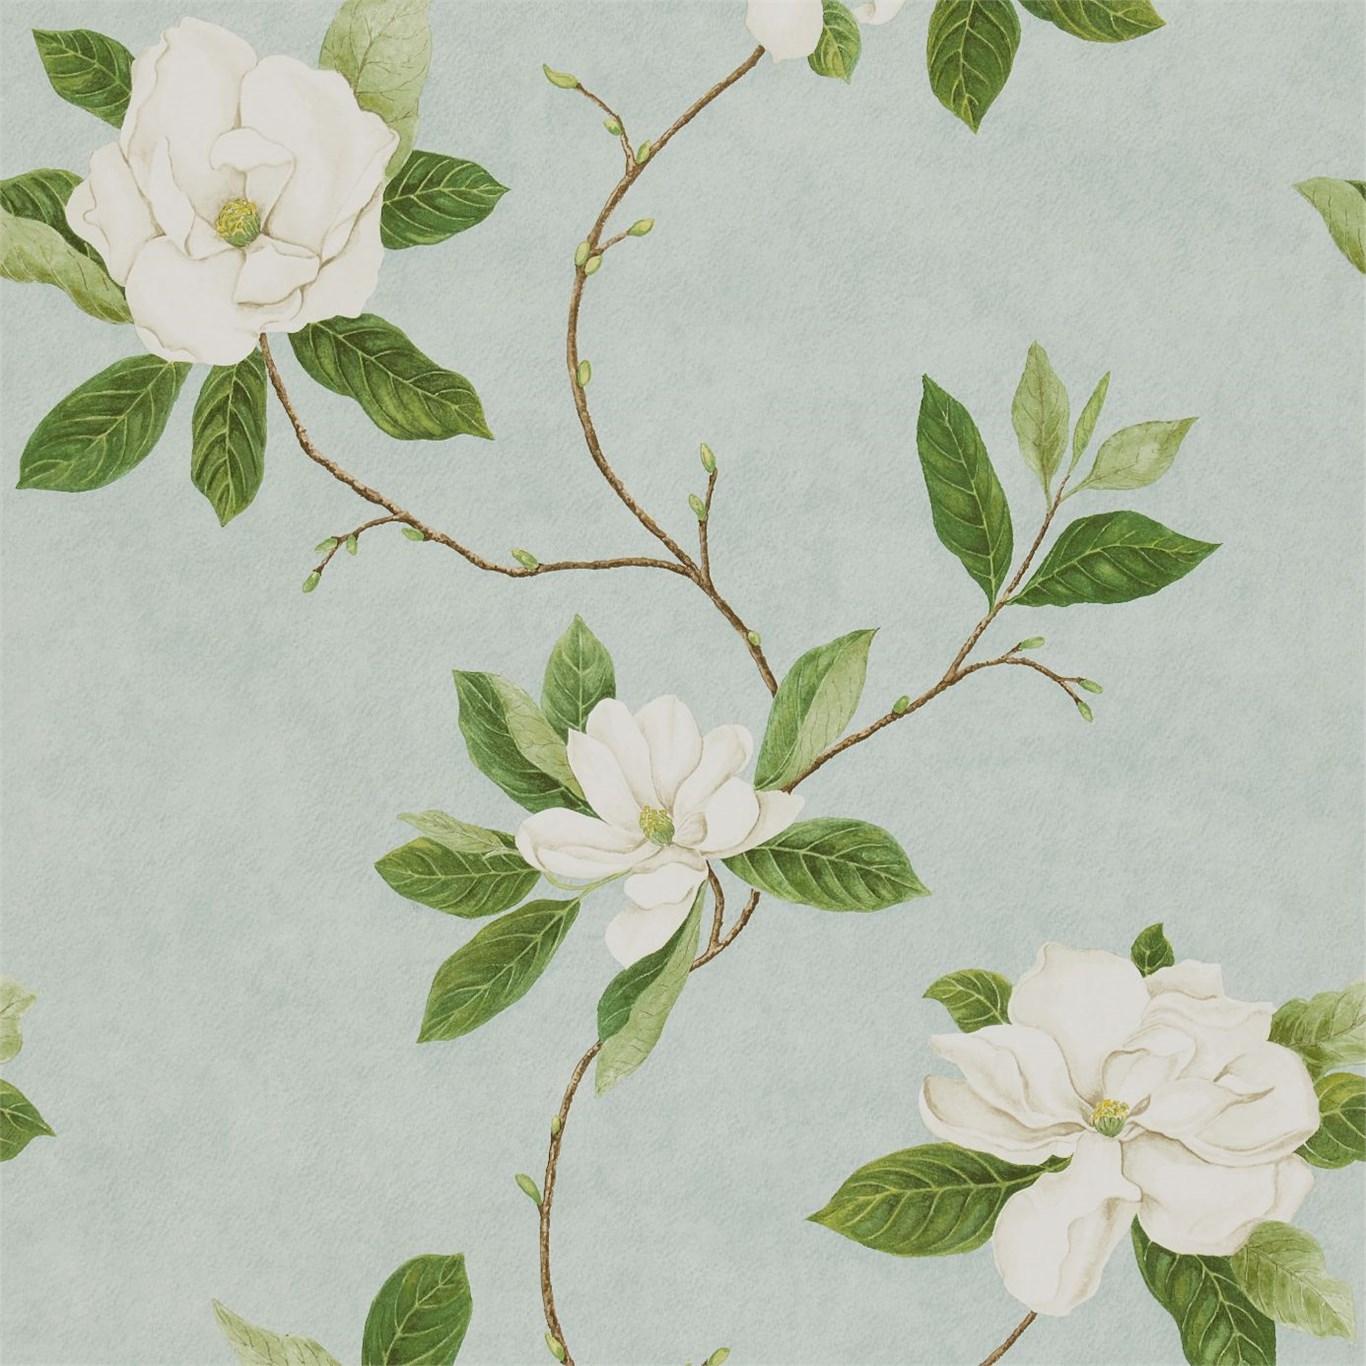 Обои Sanderson Parchment Flowers DPFWSW101, интернет магазин Волео